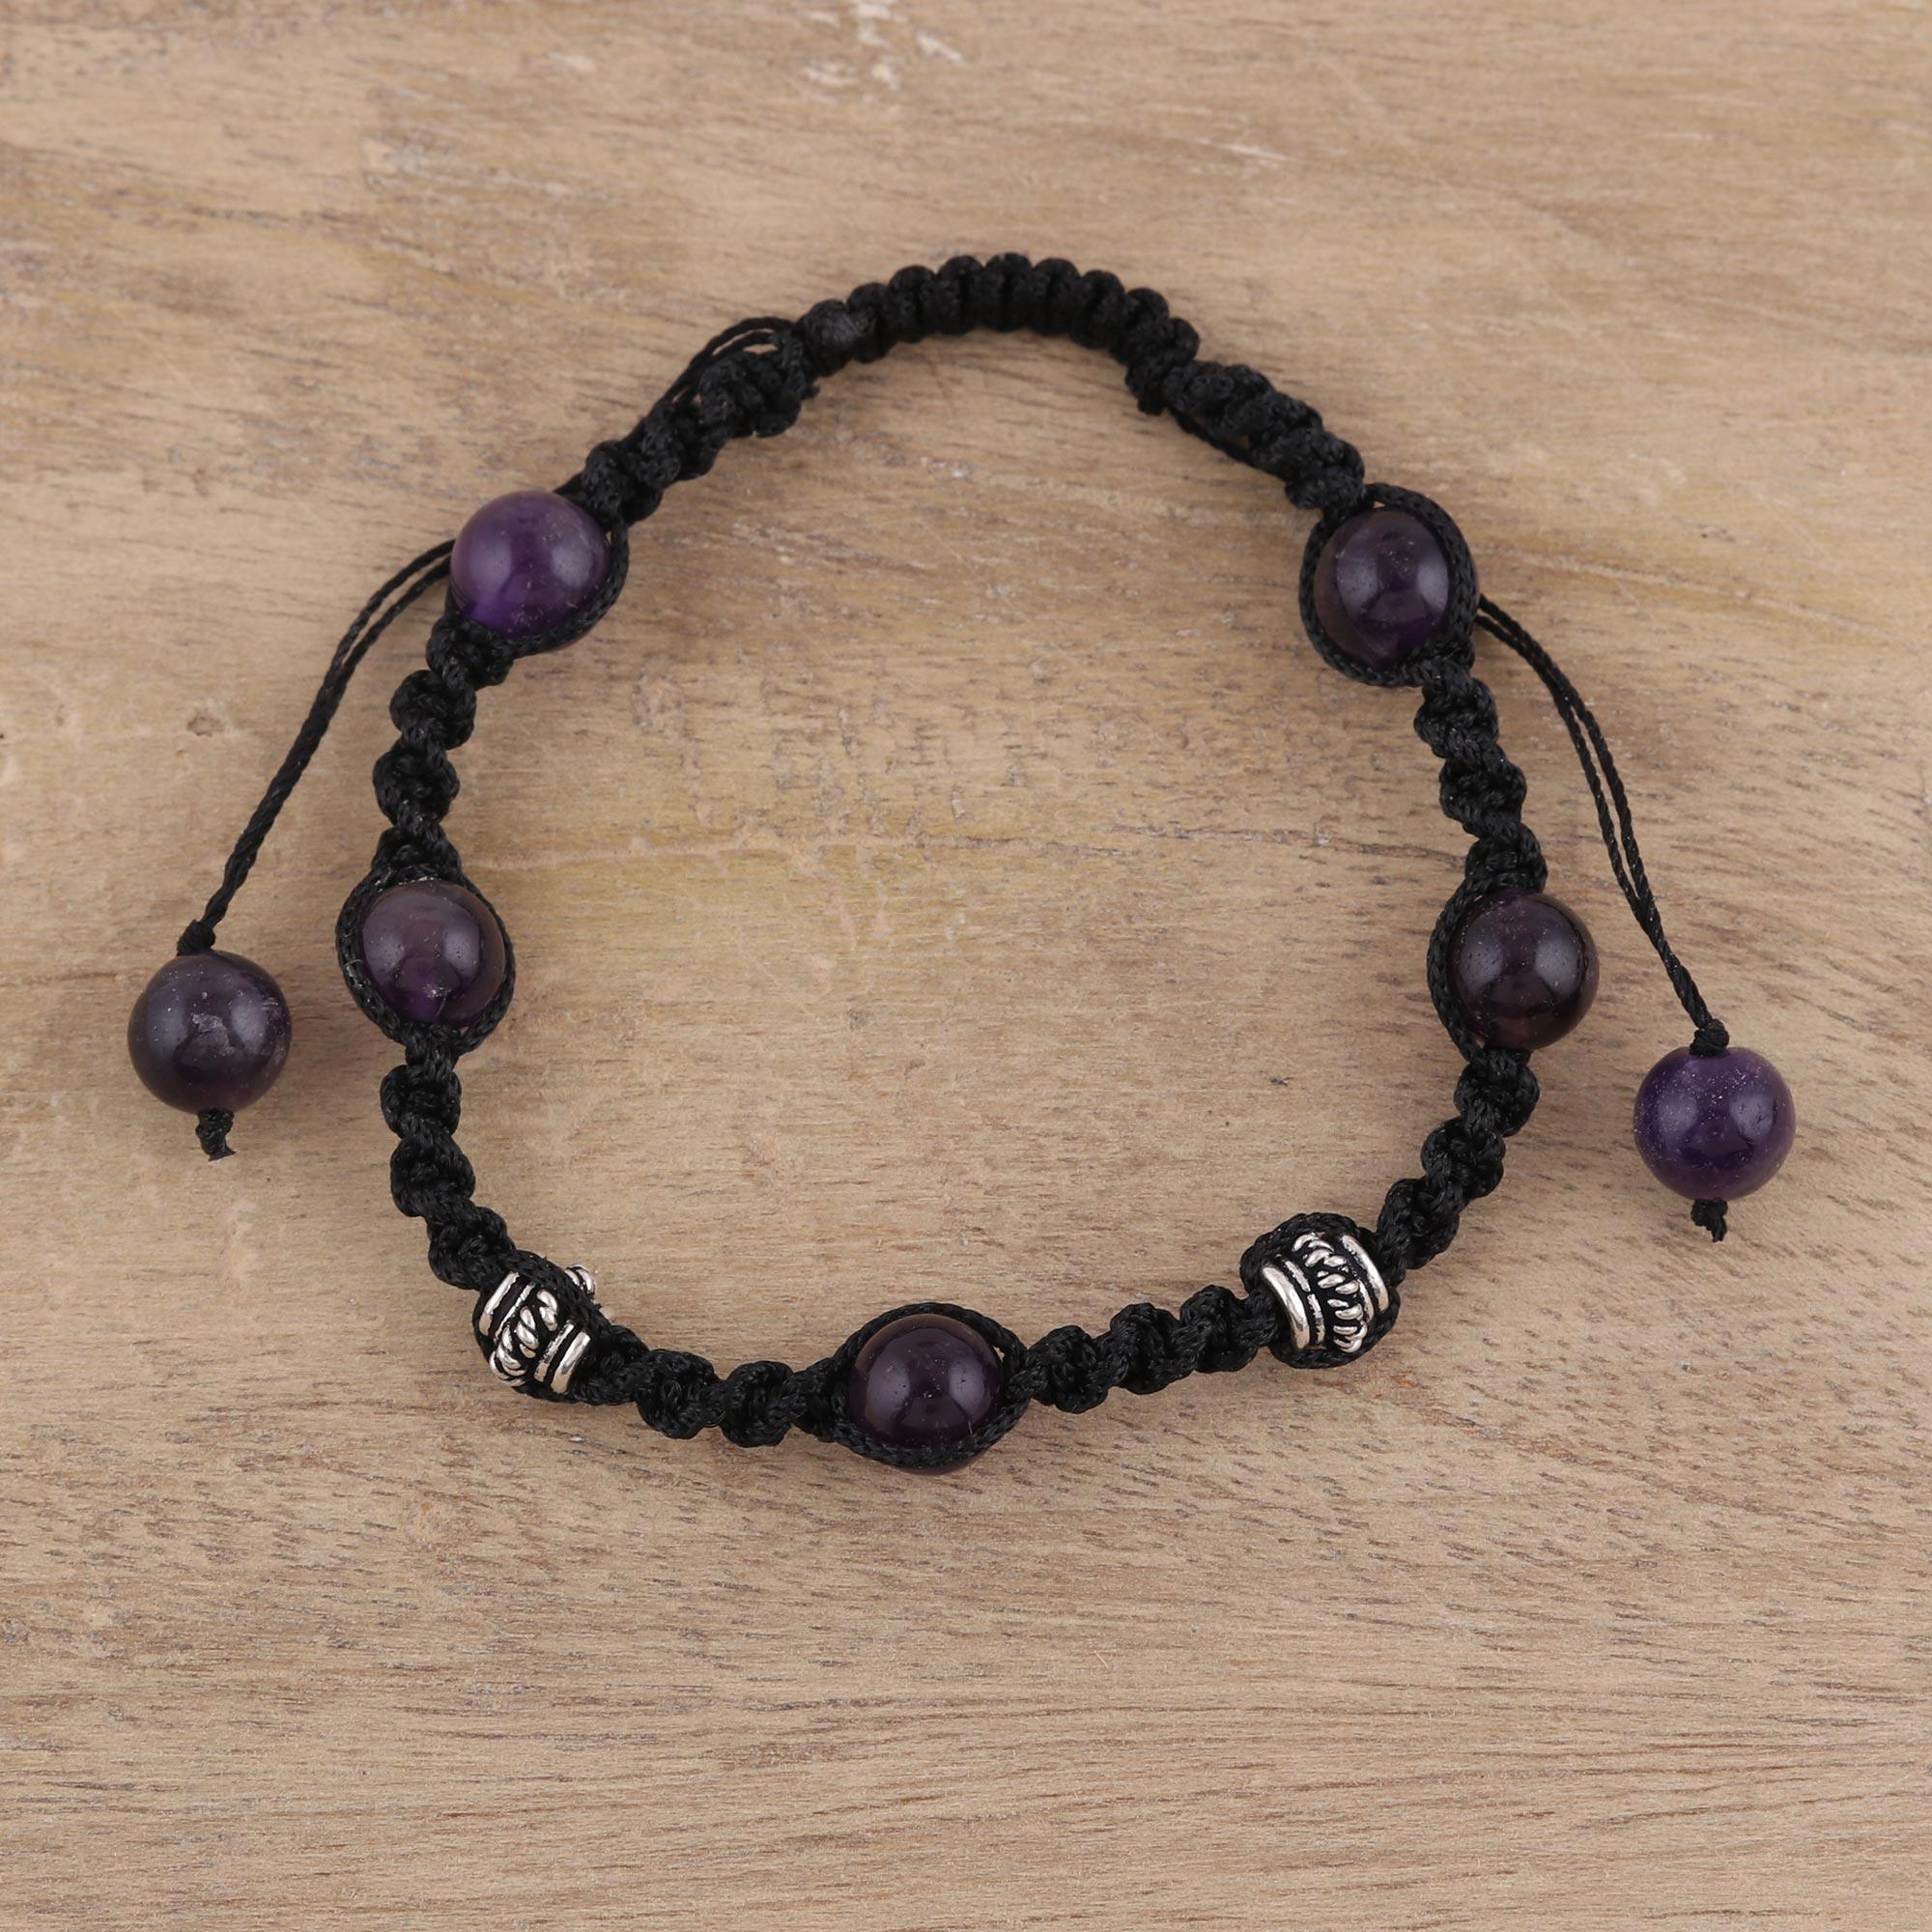 7b60069a602 UNICEF Market | Unique Handcrafted Shamballa Indian Bracelet ...